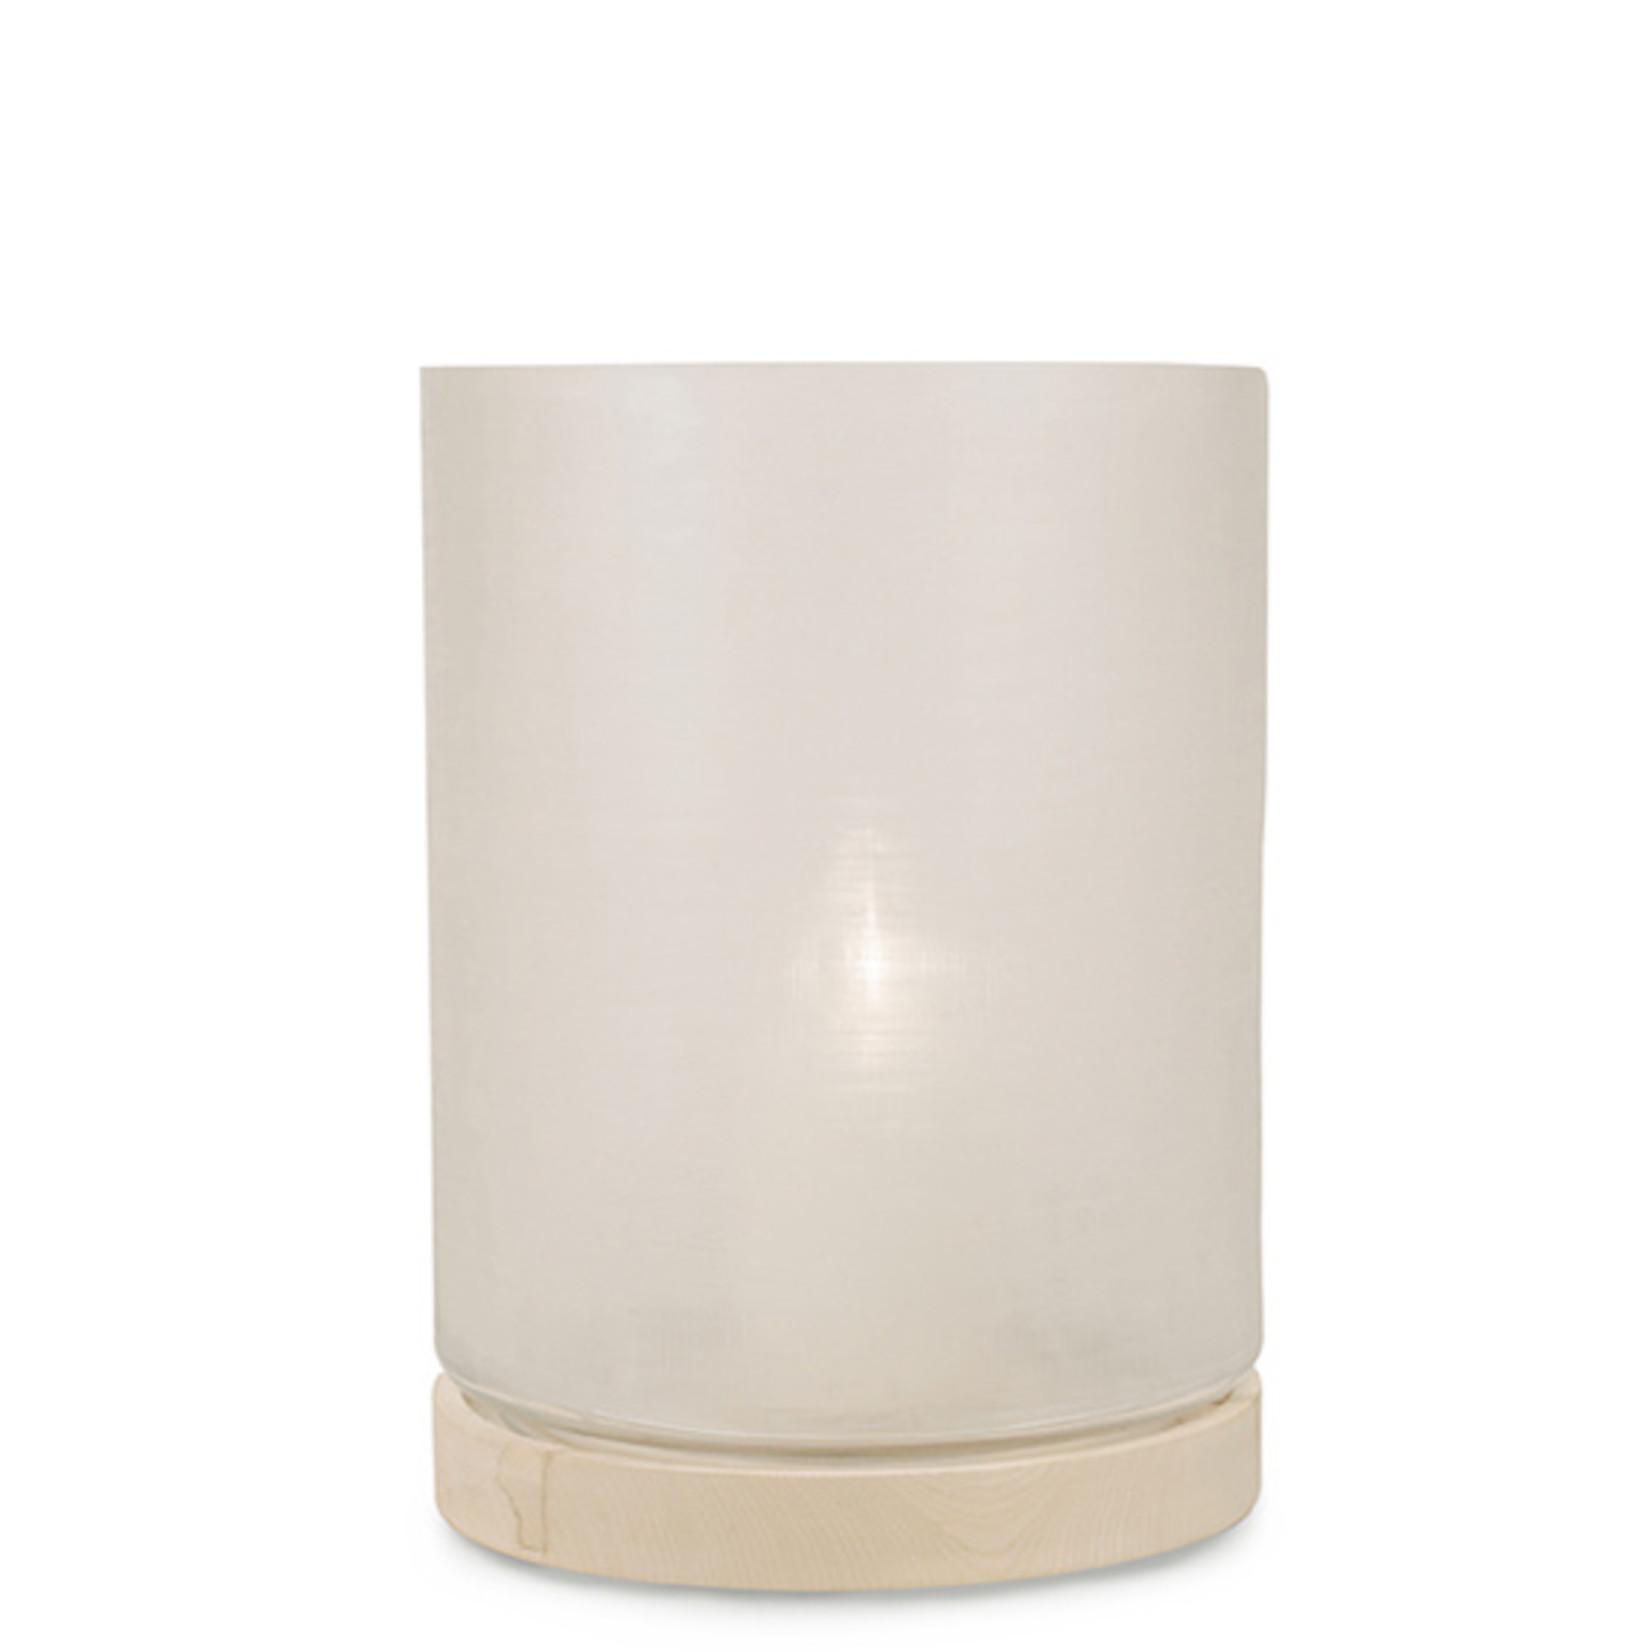 Guaxs Lanterne Aran XL | Clair / Sycomore